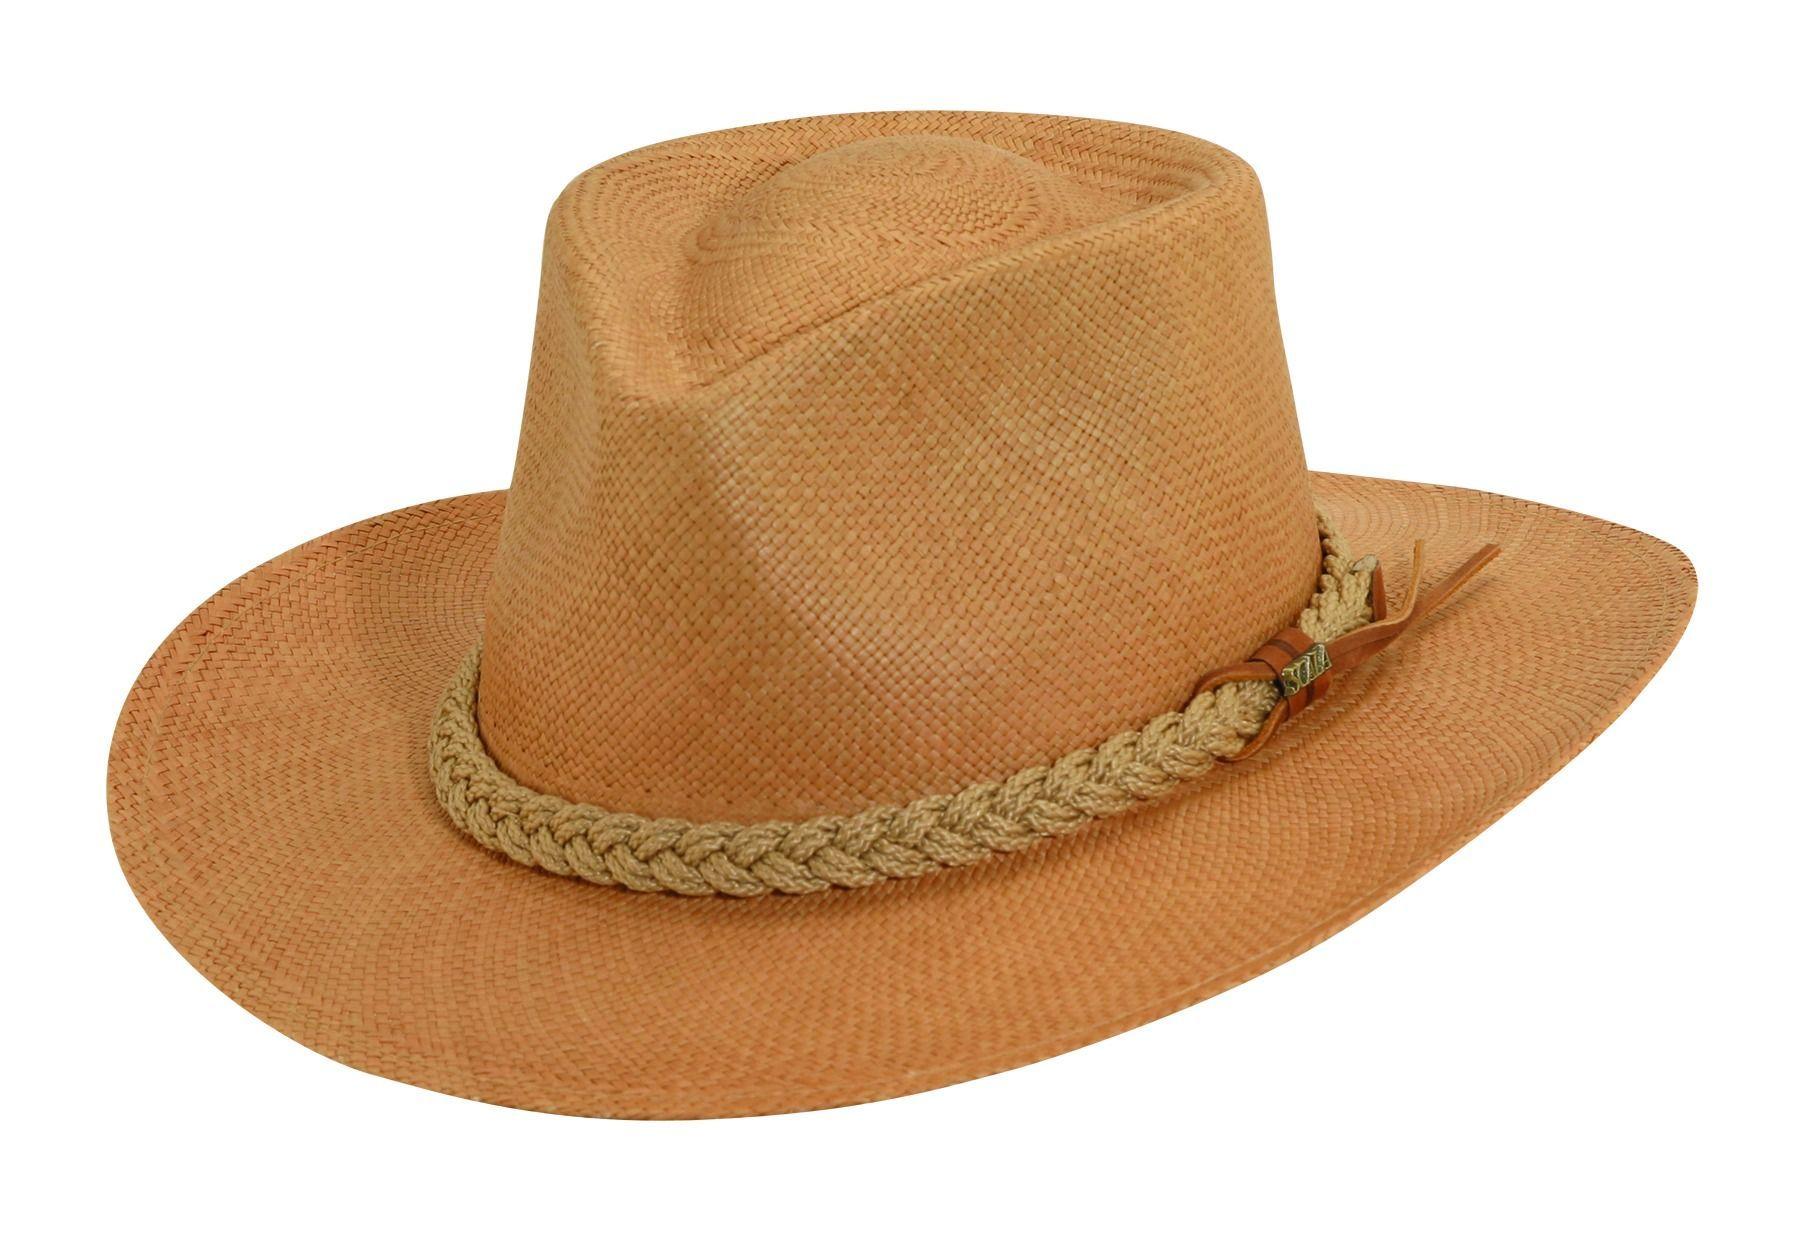 505103b4abc992 Scala - Outback Panama Hat | men hats | Hats, Panama hat, Hats for men